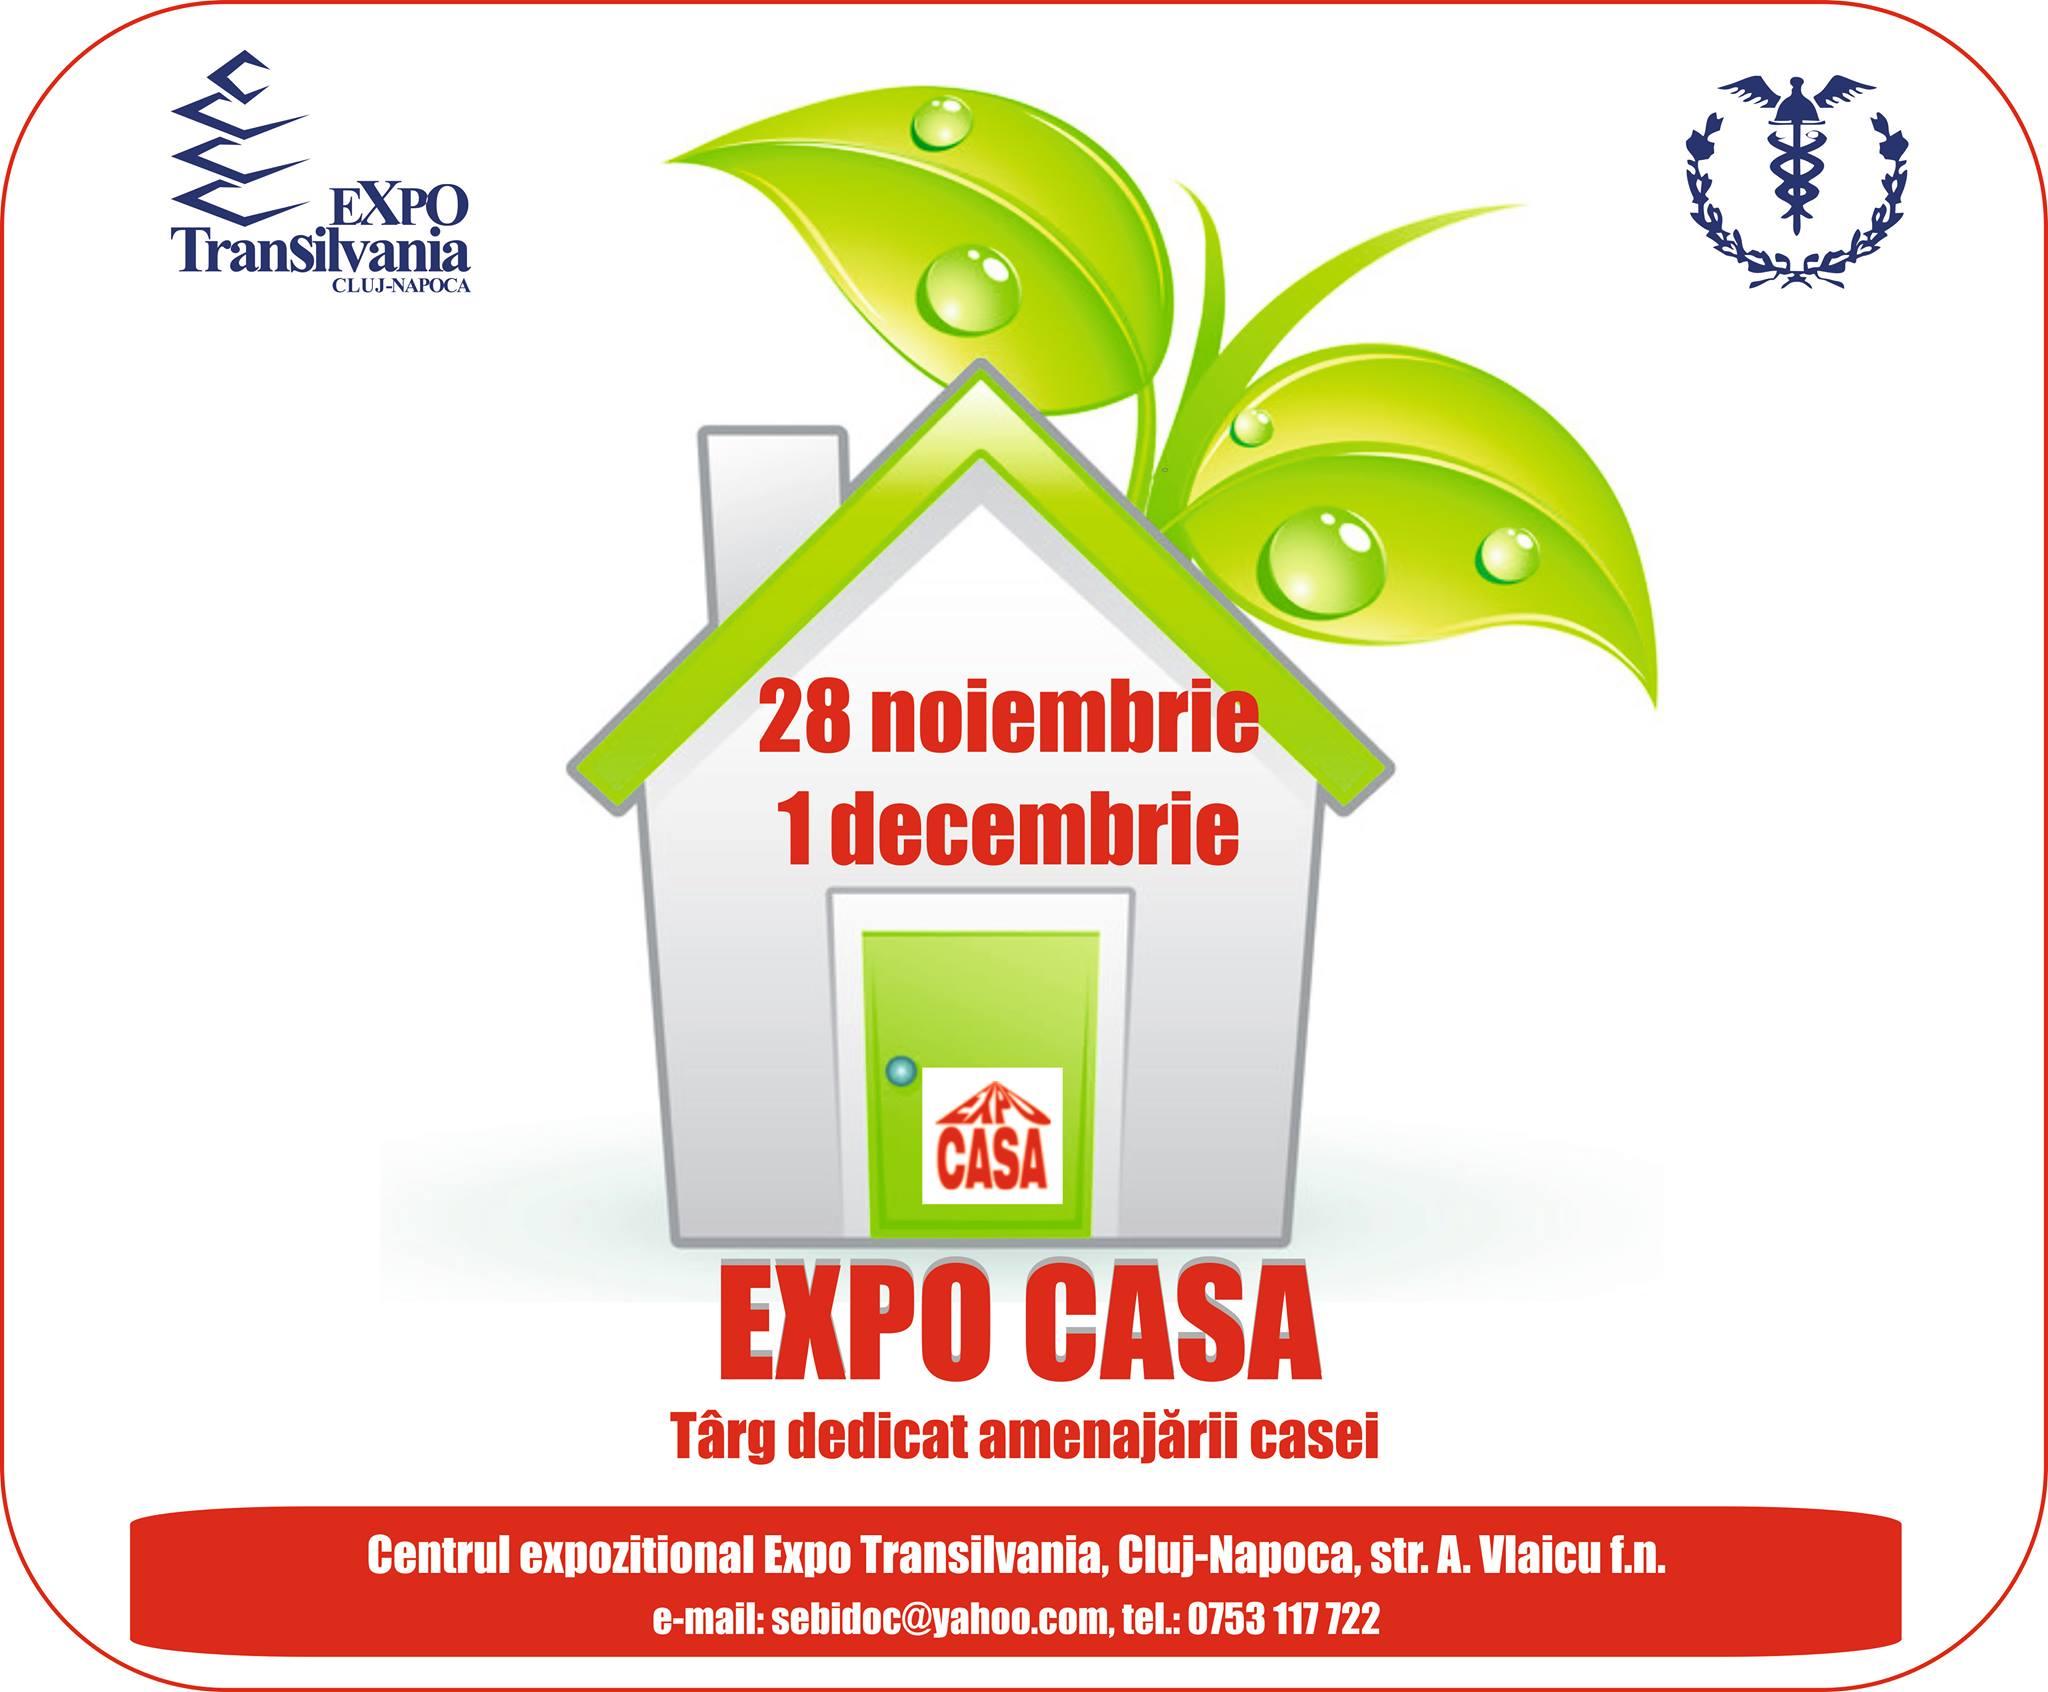 Expo Casa – Târg dedicat amenajării casei